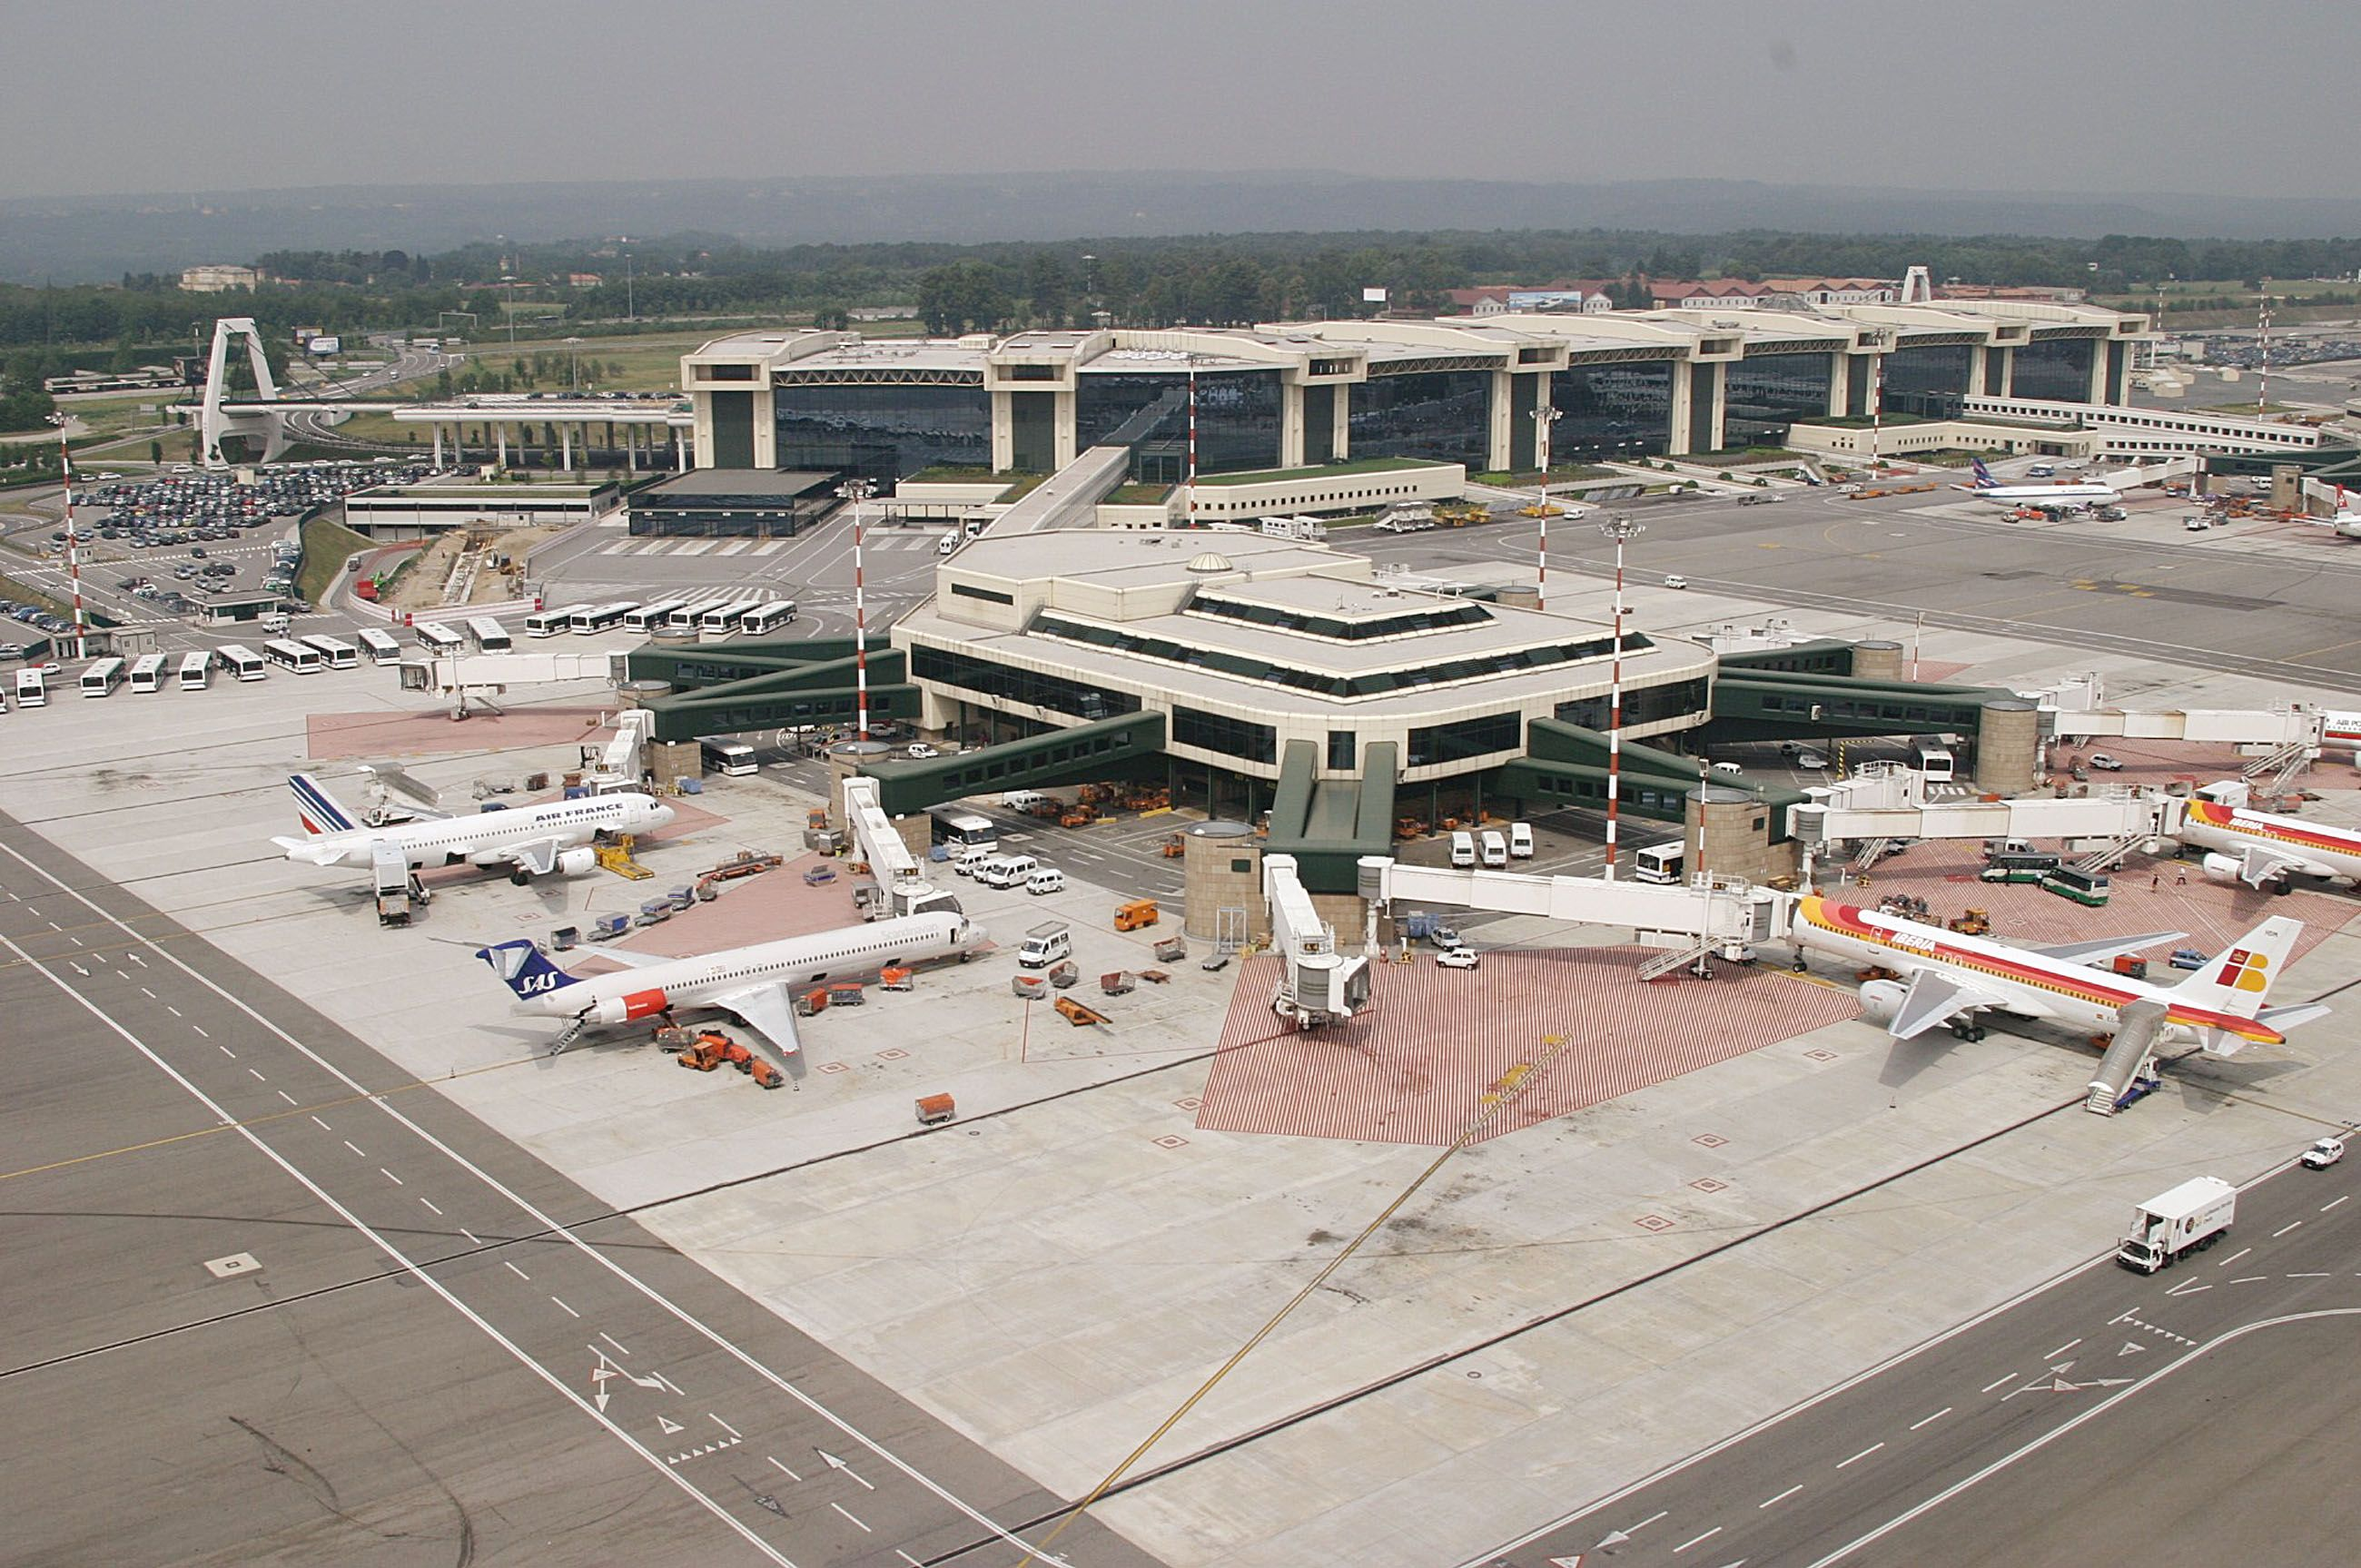 Aeroporto Ewr : Aeroporto milano linate lin milaan airports italy